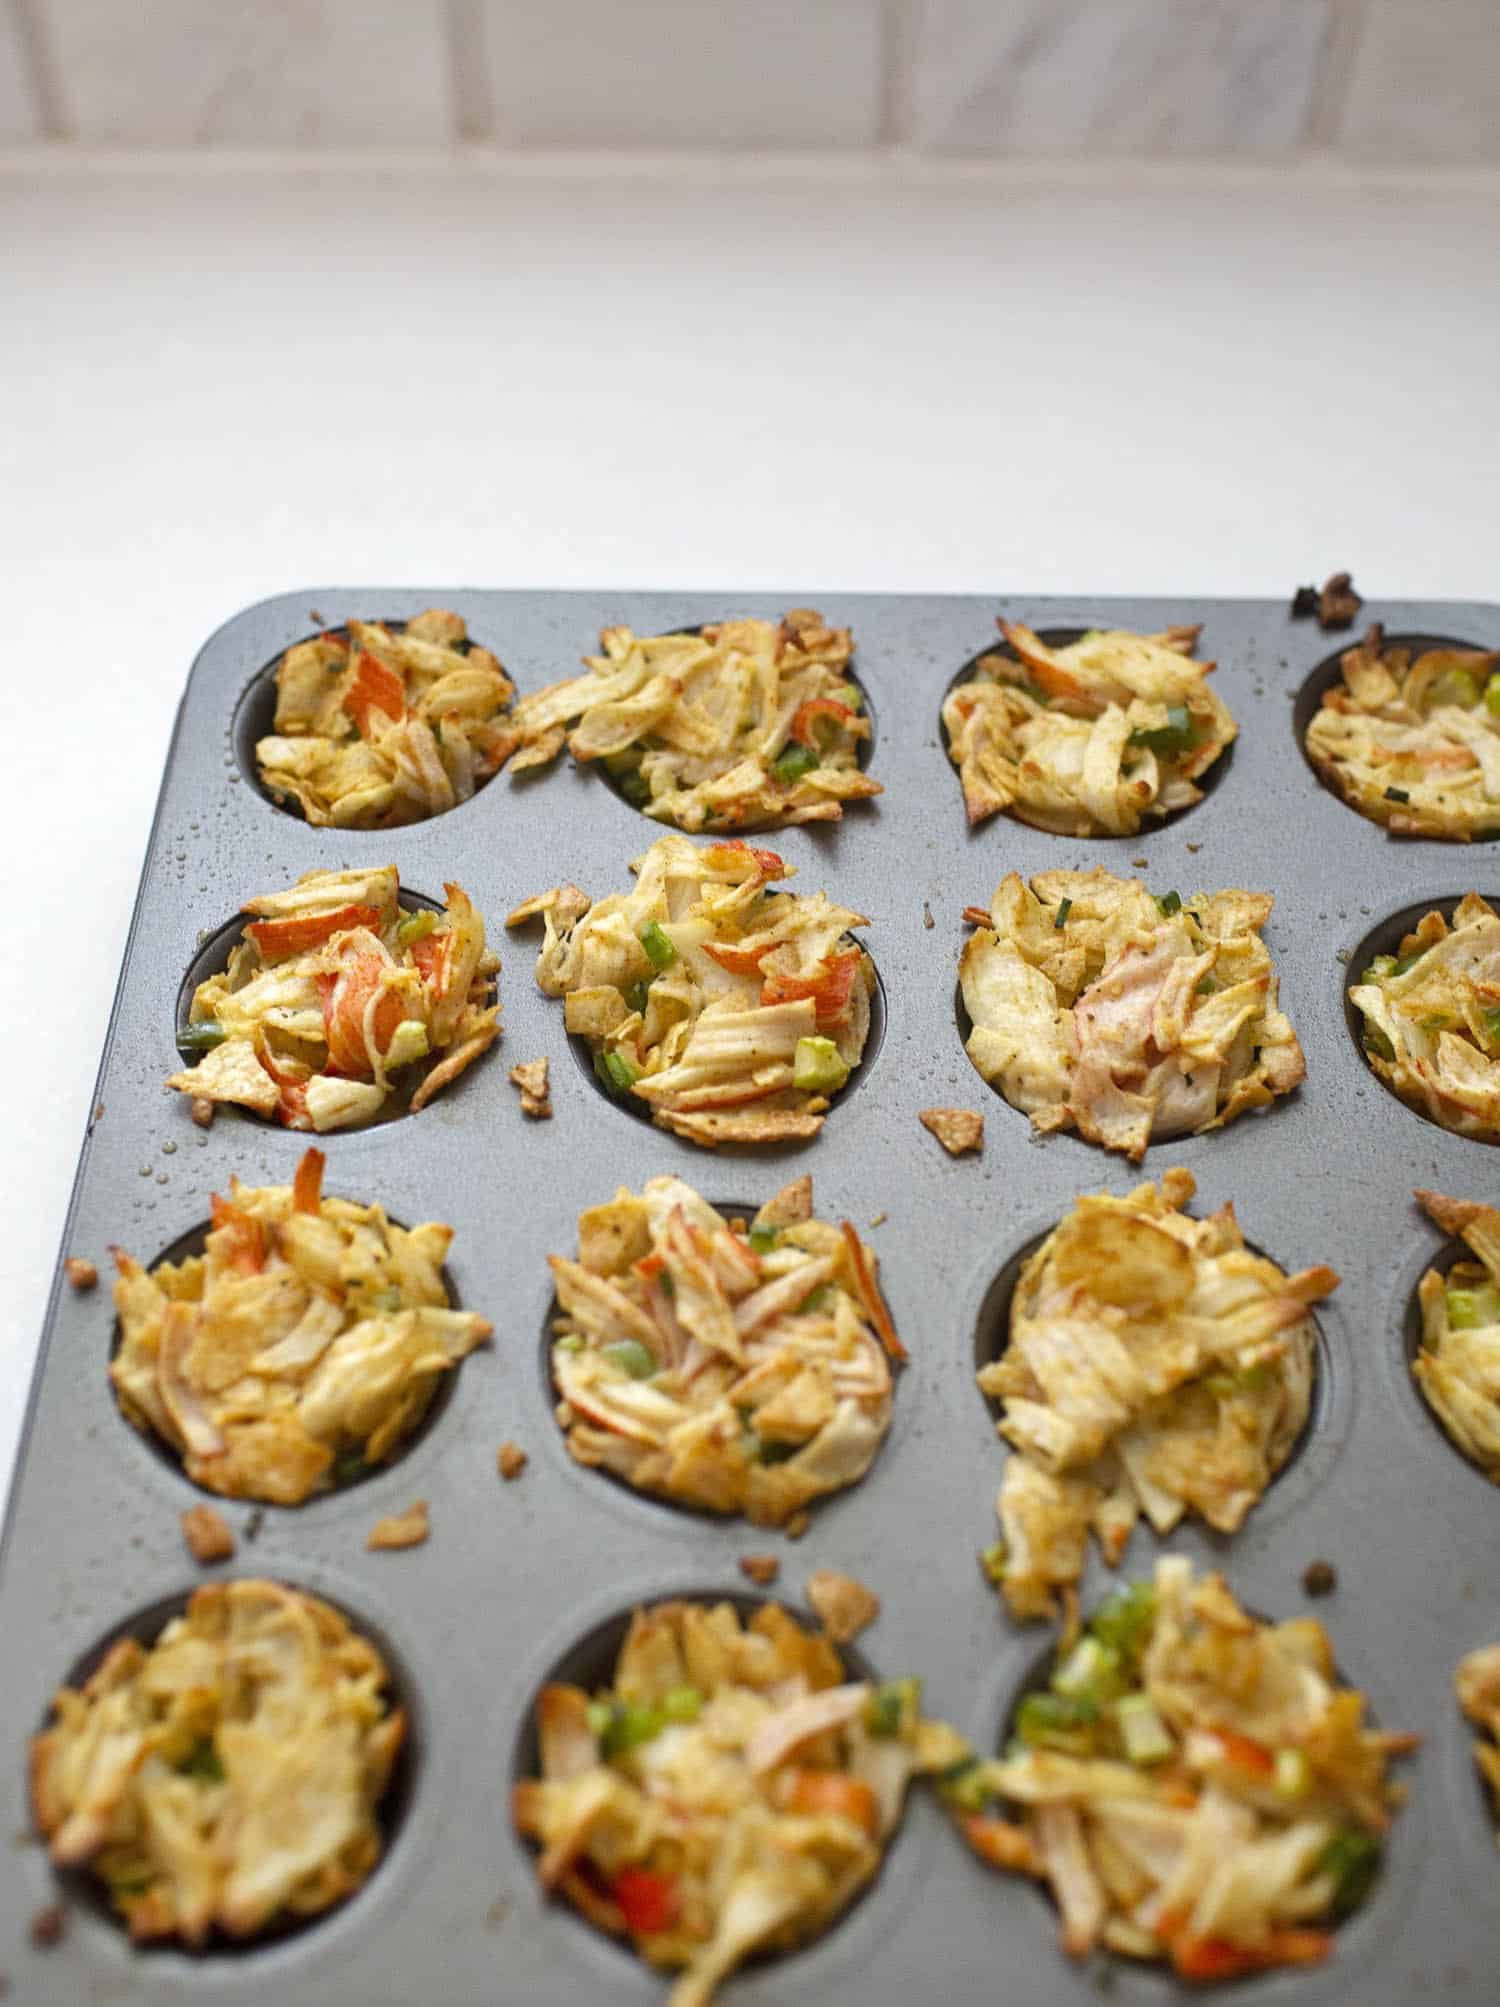 Baked Potato Chip Crab Cakes A Beautiful Mess